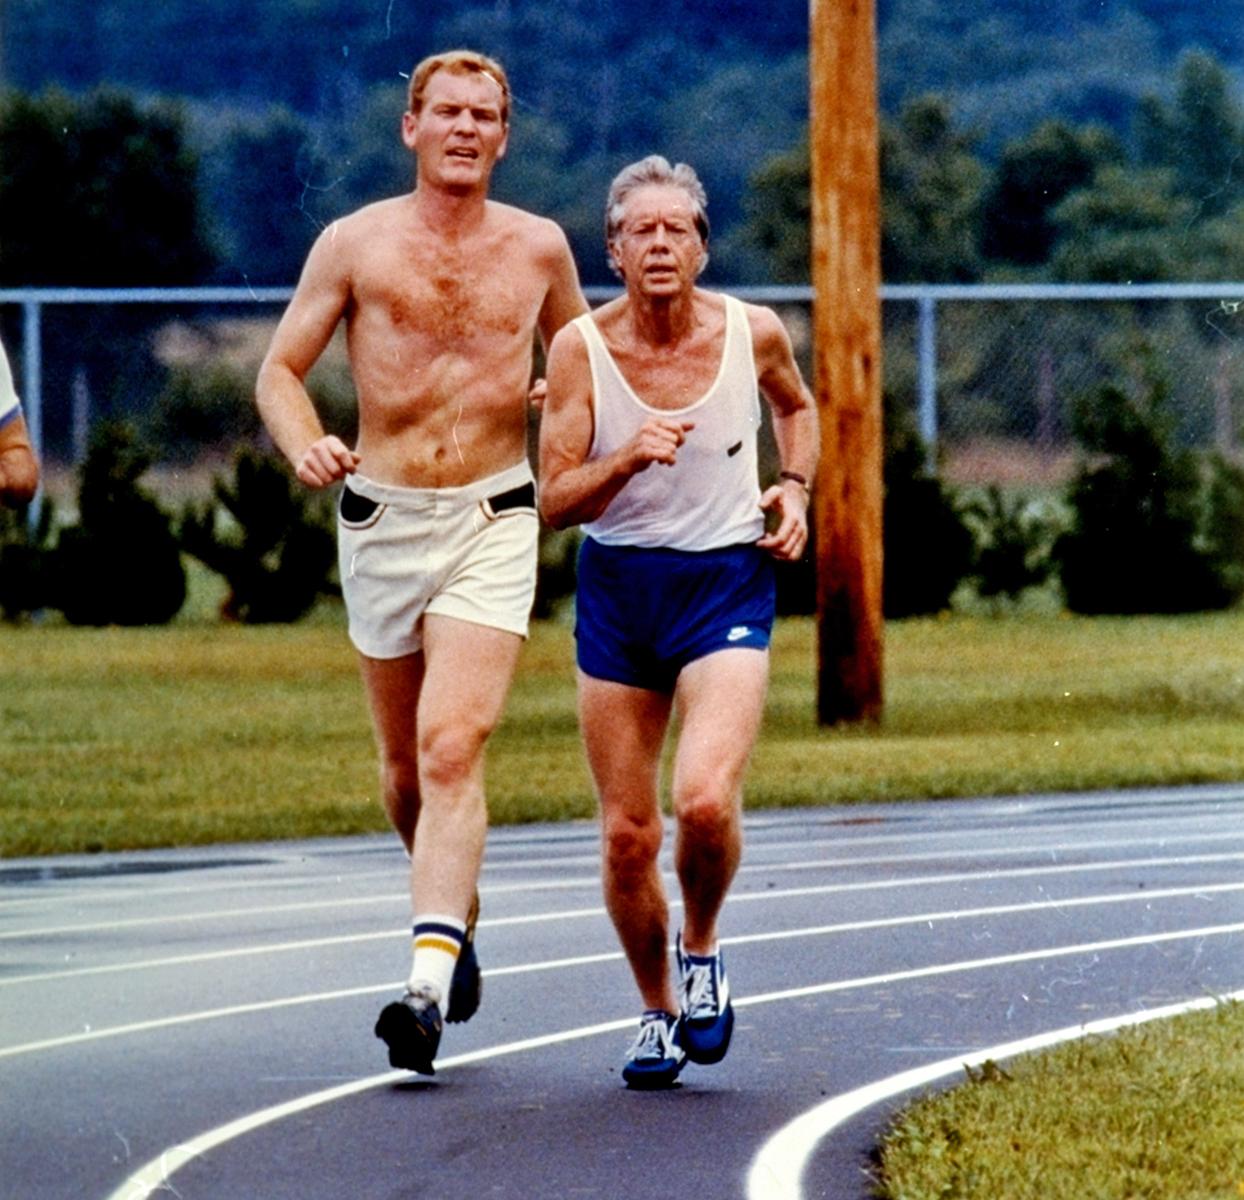 39-й президент США Джимми Картер на пробежке